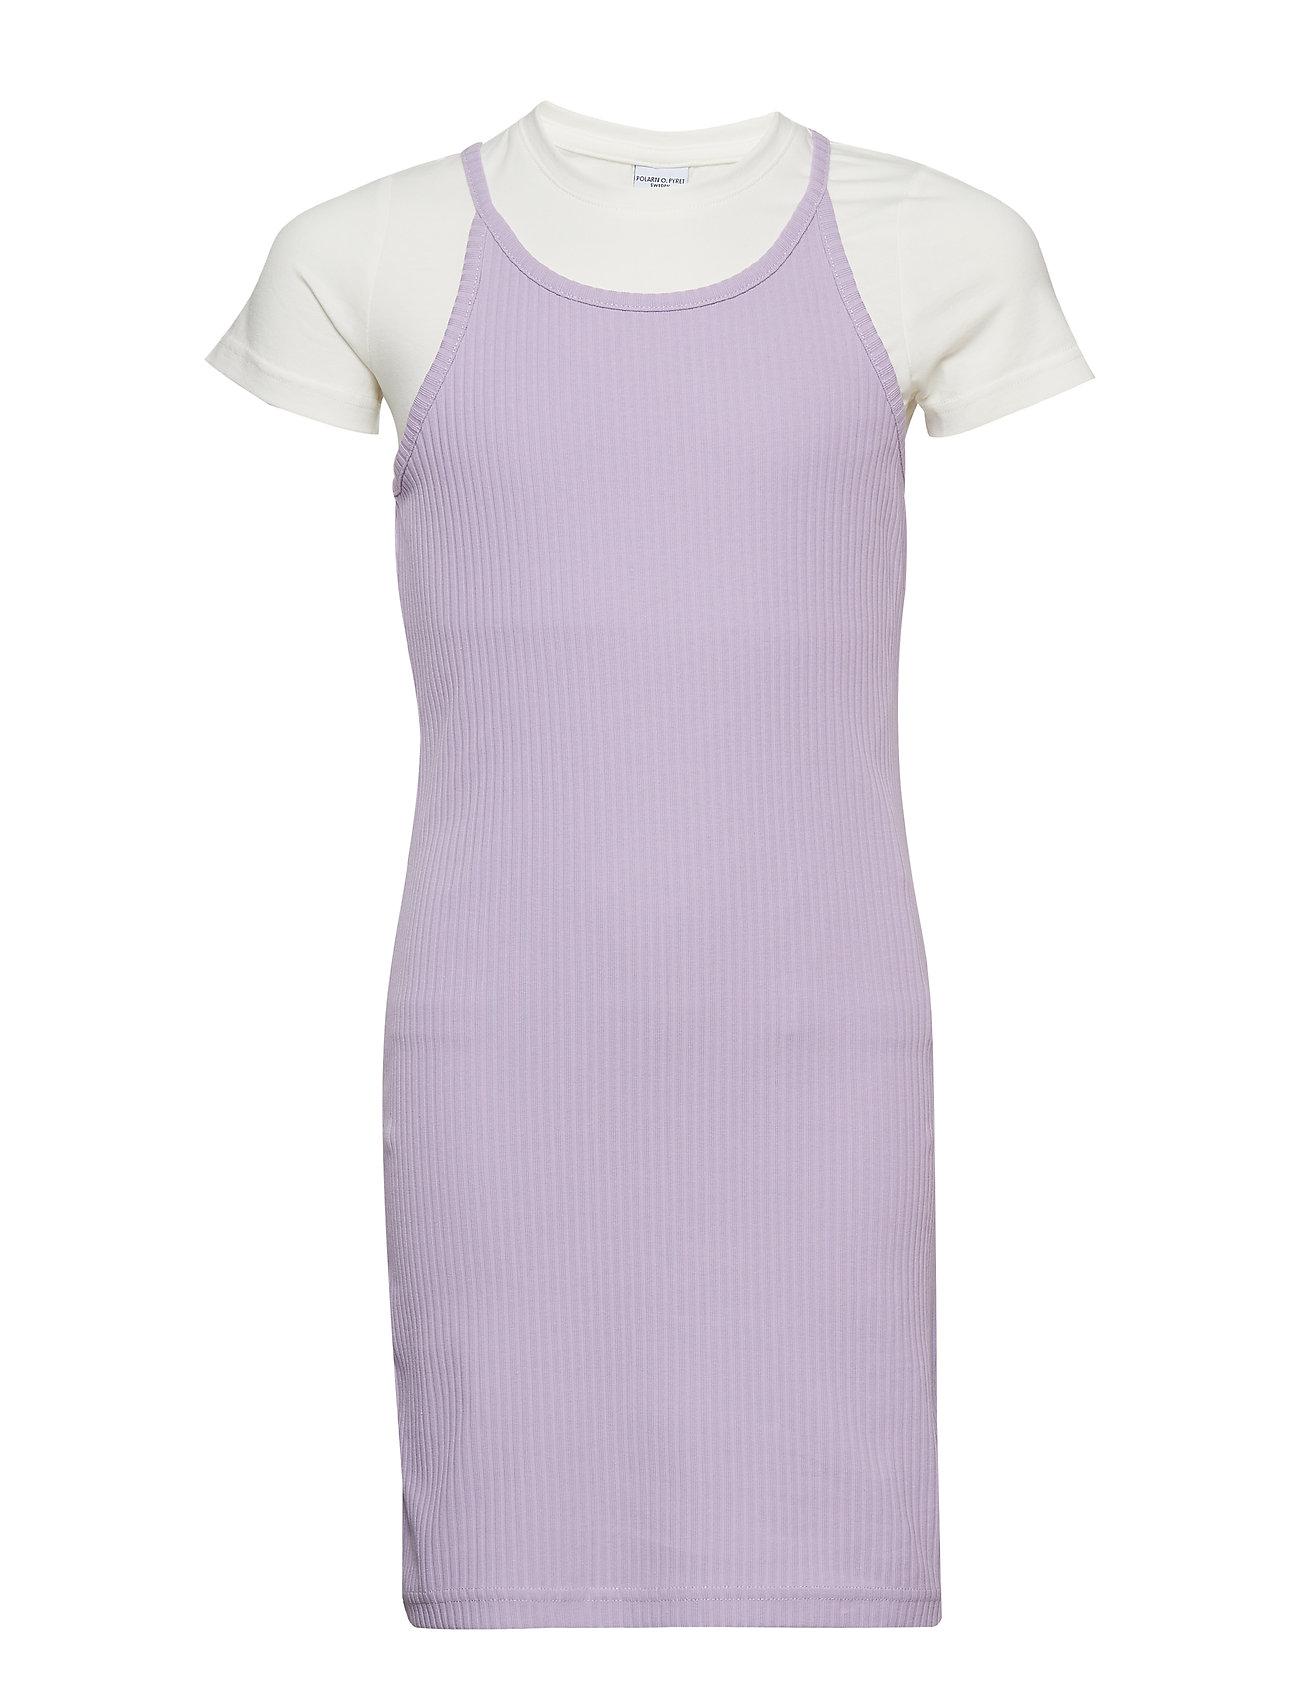 Polarn O. Pyret Dress S/S School - LAVENDULA